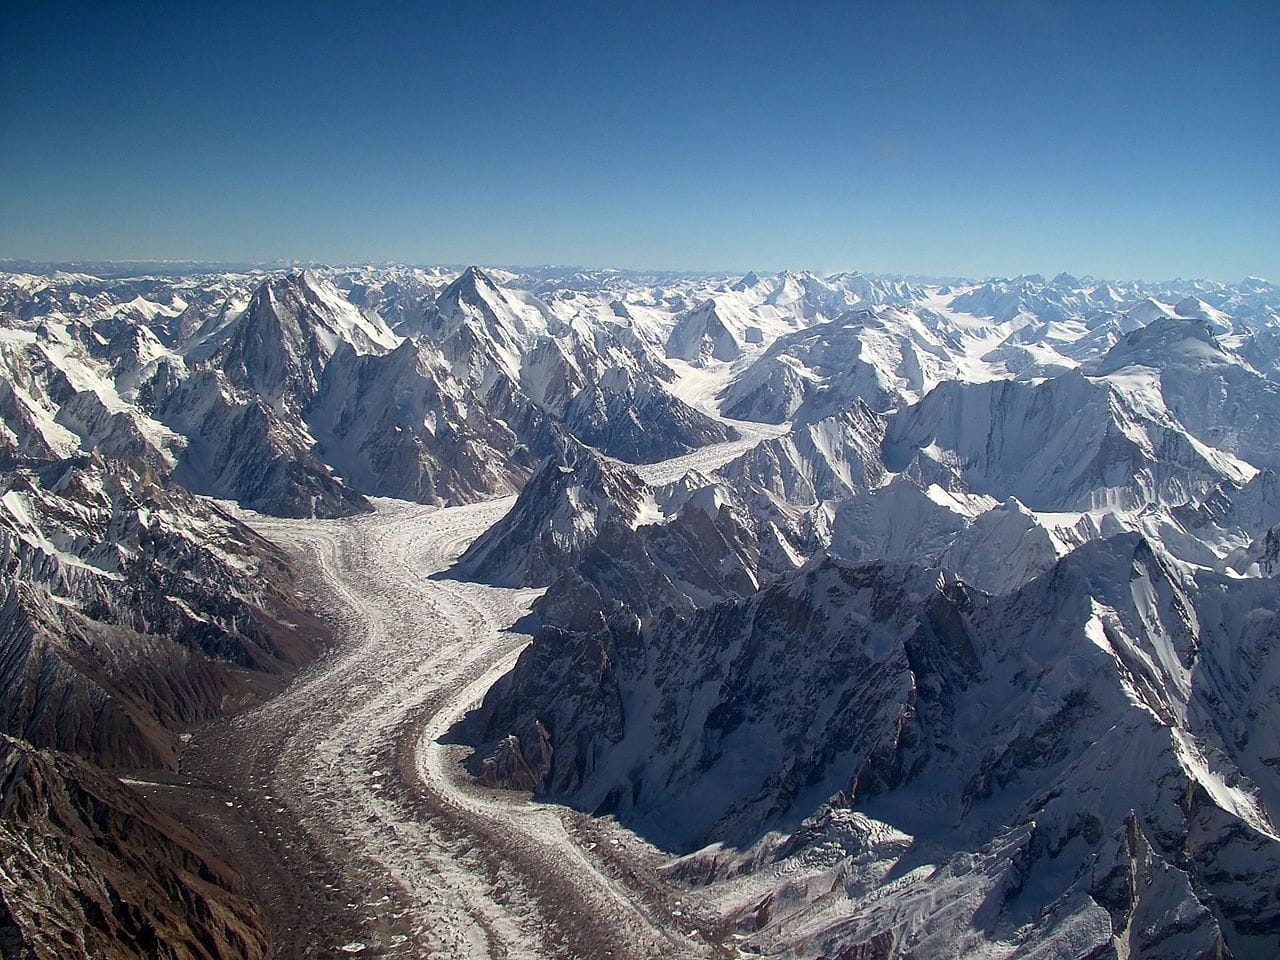 baltoro glacier by Guilhem Vellut wikimedia commons